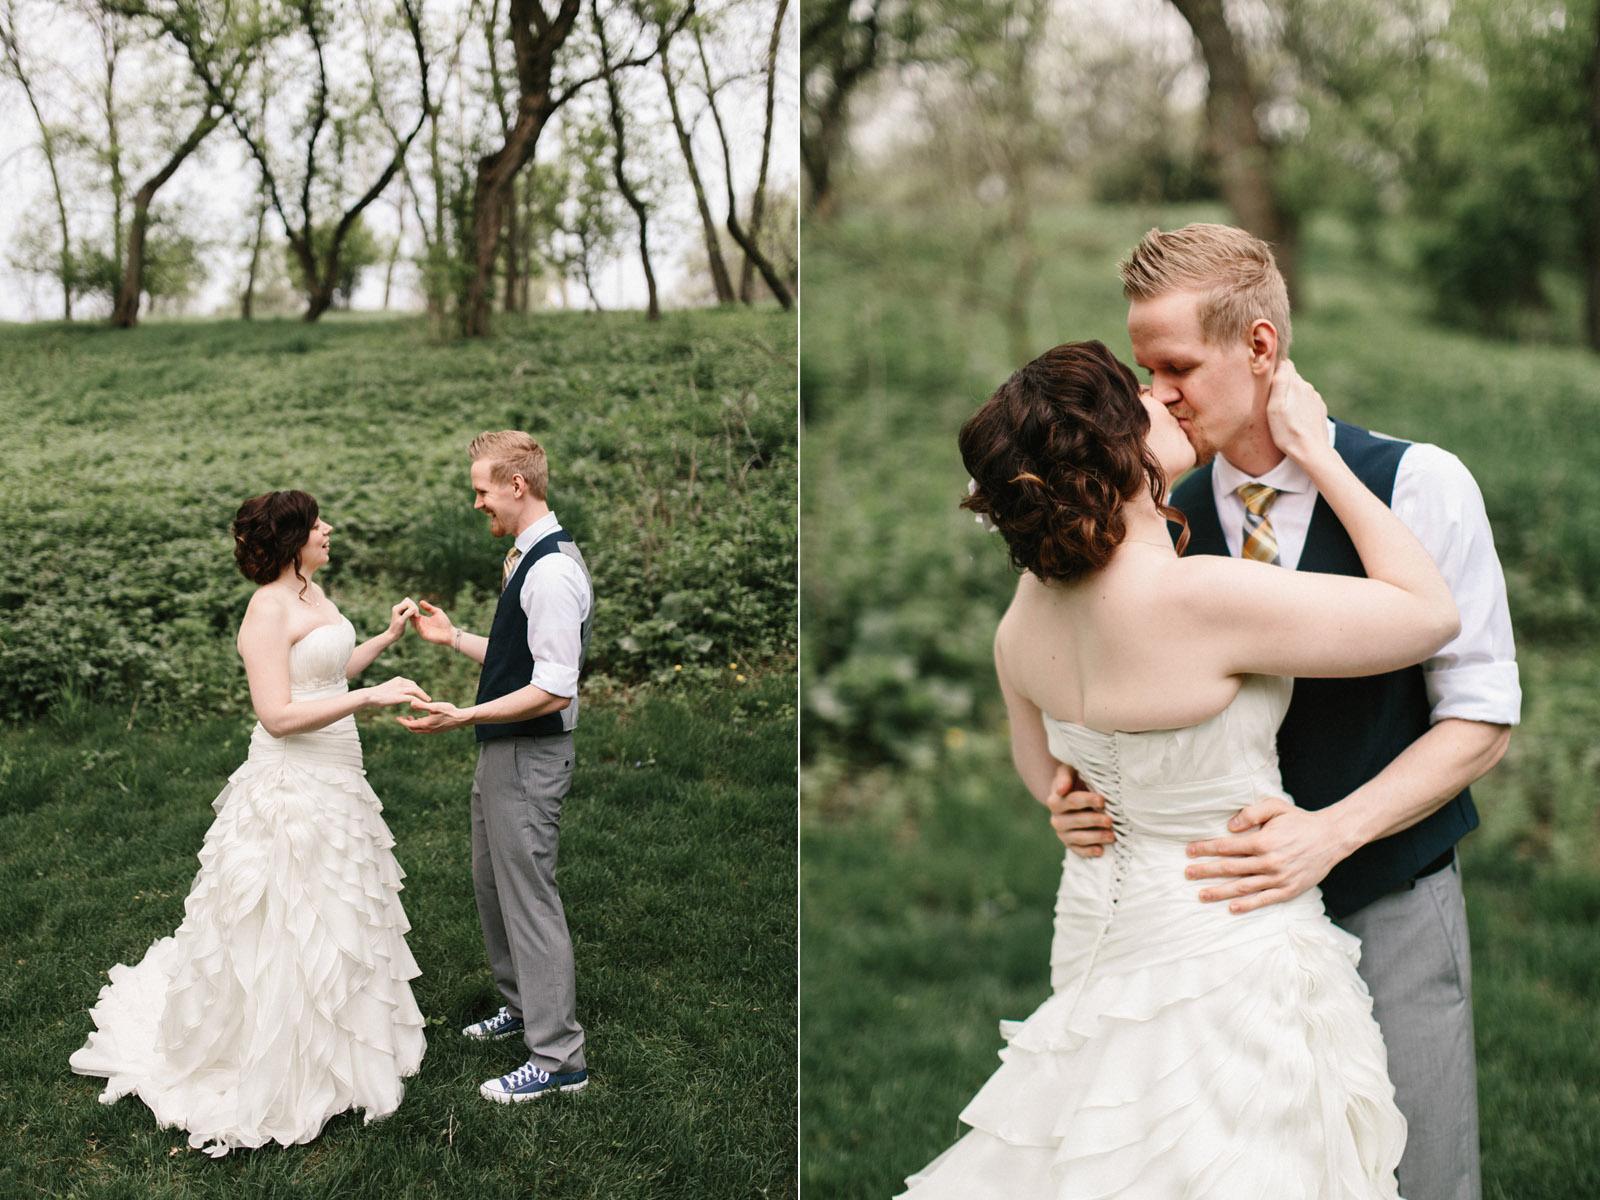 DesMoines_Wedding_Photographer_Spencer&Amanda_021.jpg